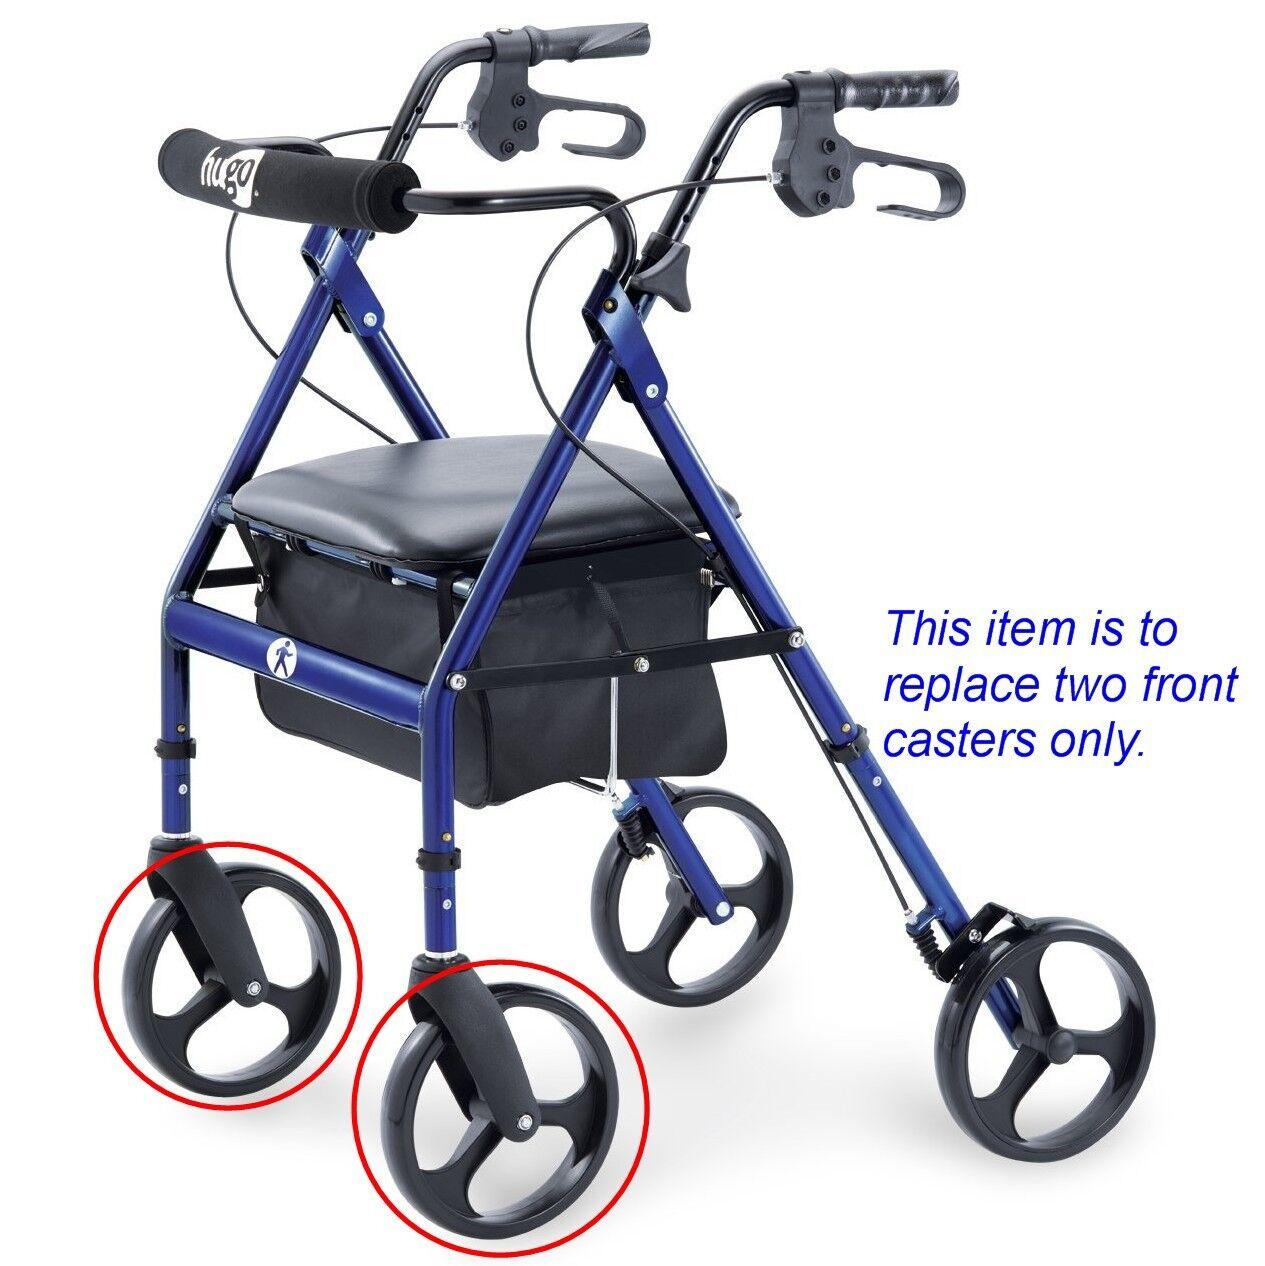 hugo navigator walker transport chair plastic stackable chairs bunnings rollator transporter 8 front caster wheel c4608 bk fit elite for not rear